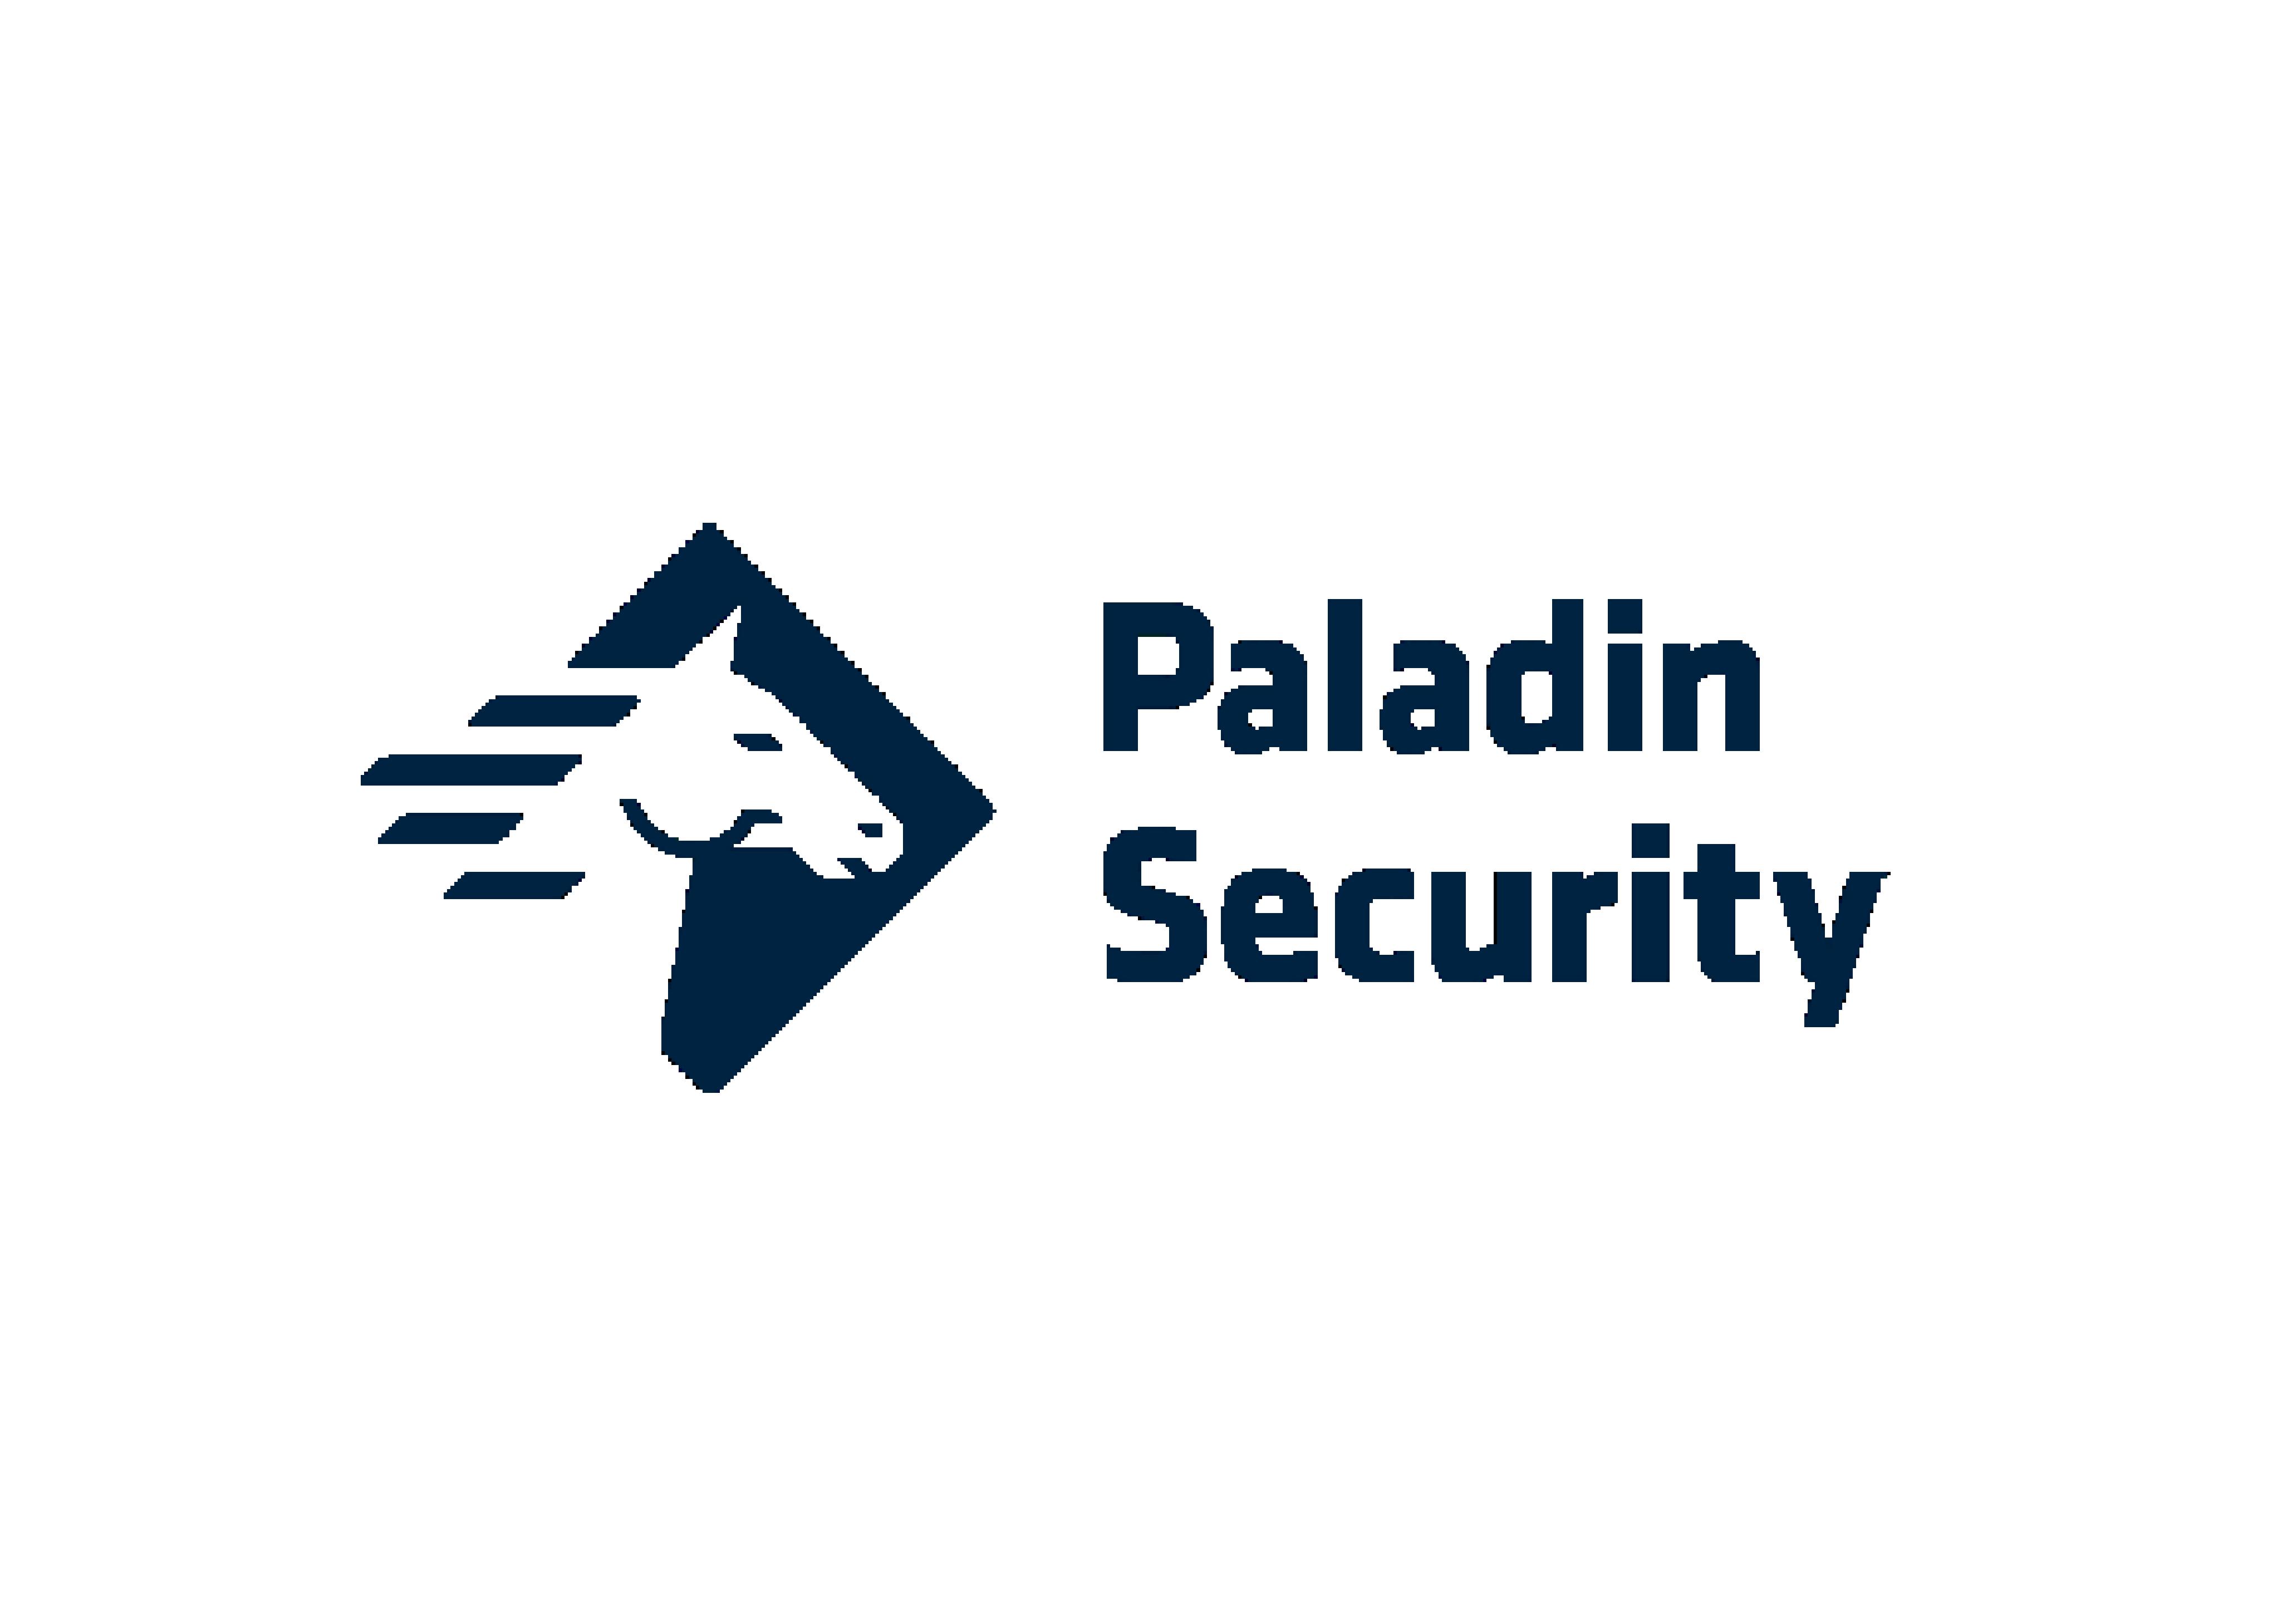 https://palamerican.com/wp-content/uploads/2021/06/PSG-1-01.png